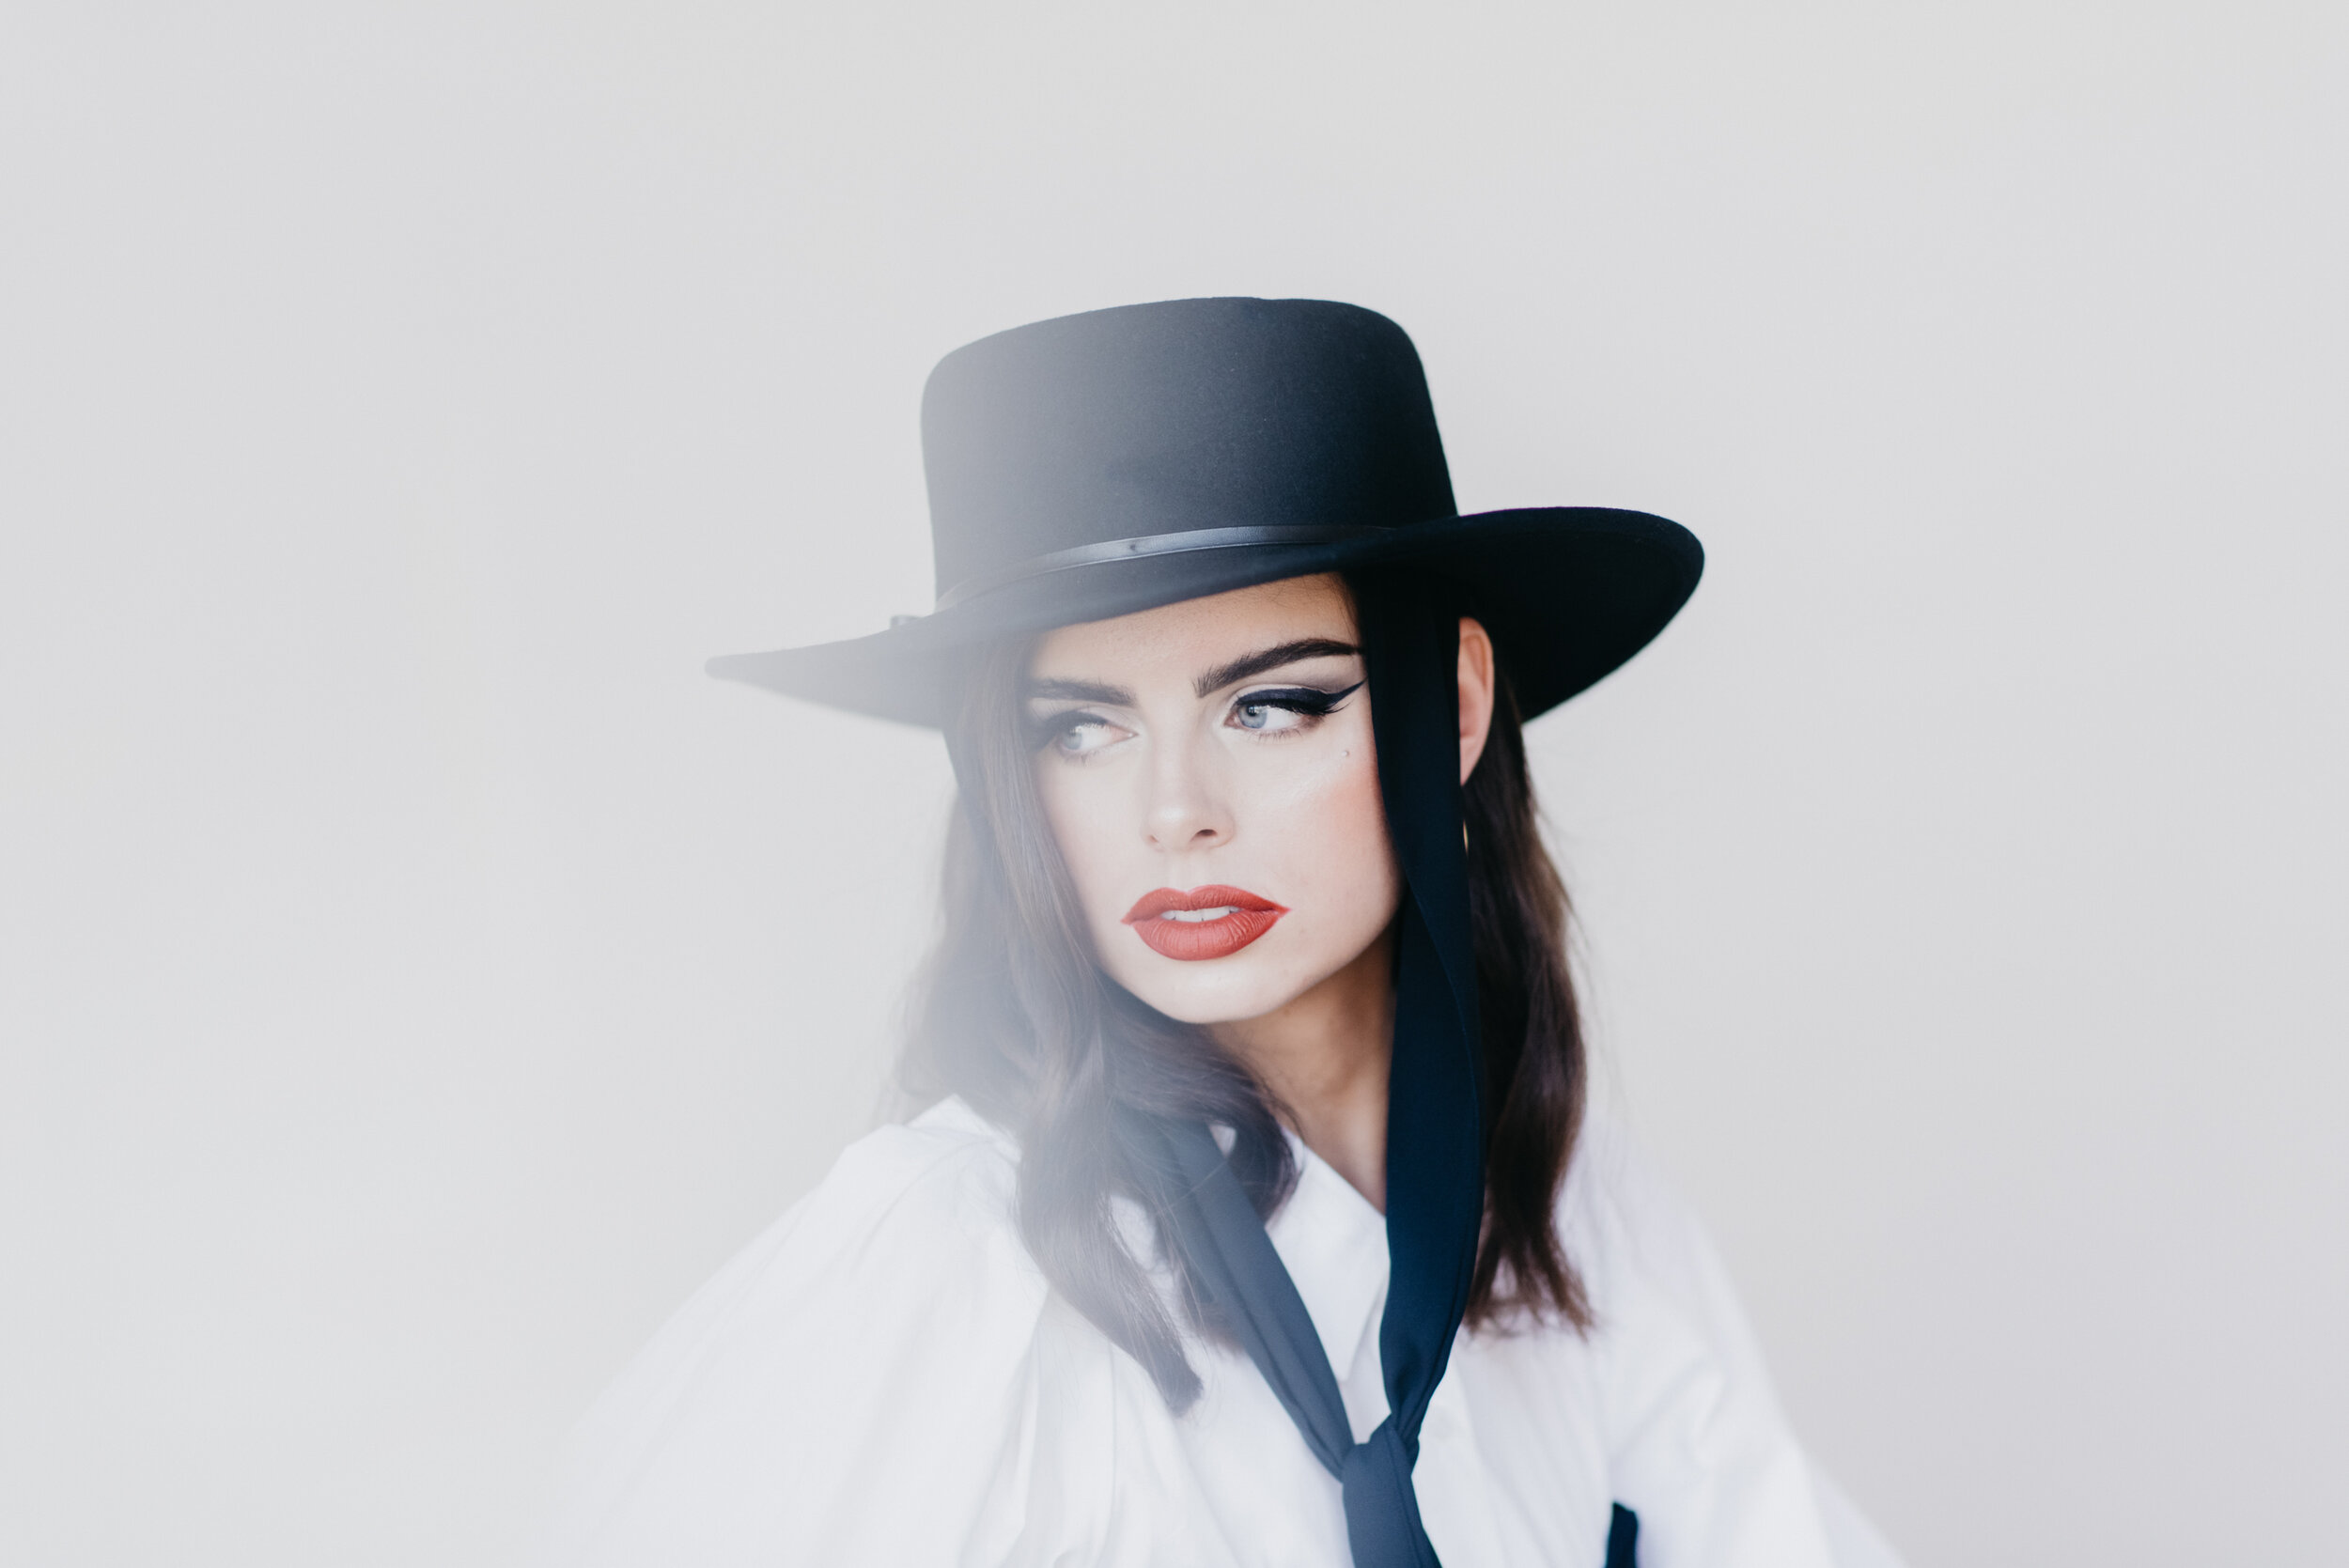 Photographer: Andrea Hutchison Model: Lucy Duane (Heyman Talent) Styling: Miranda McDonald